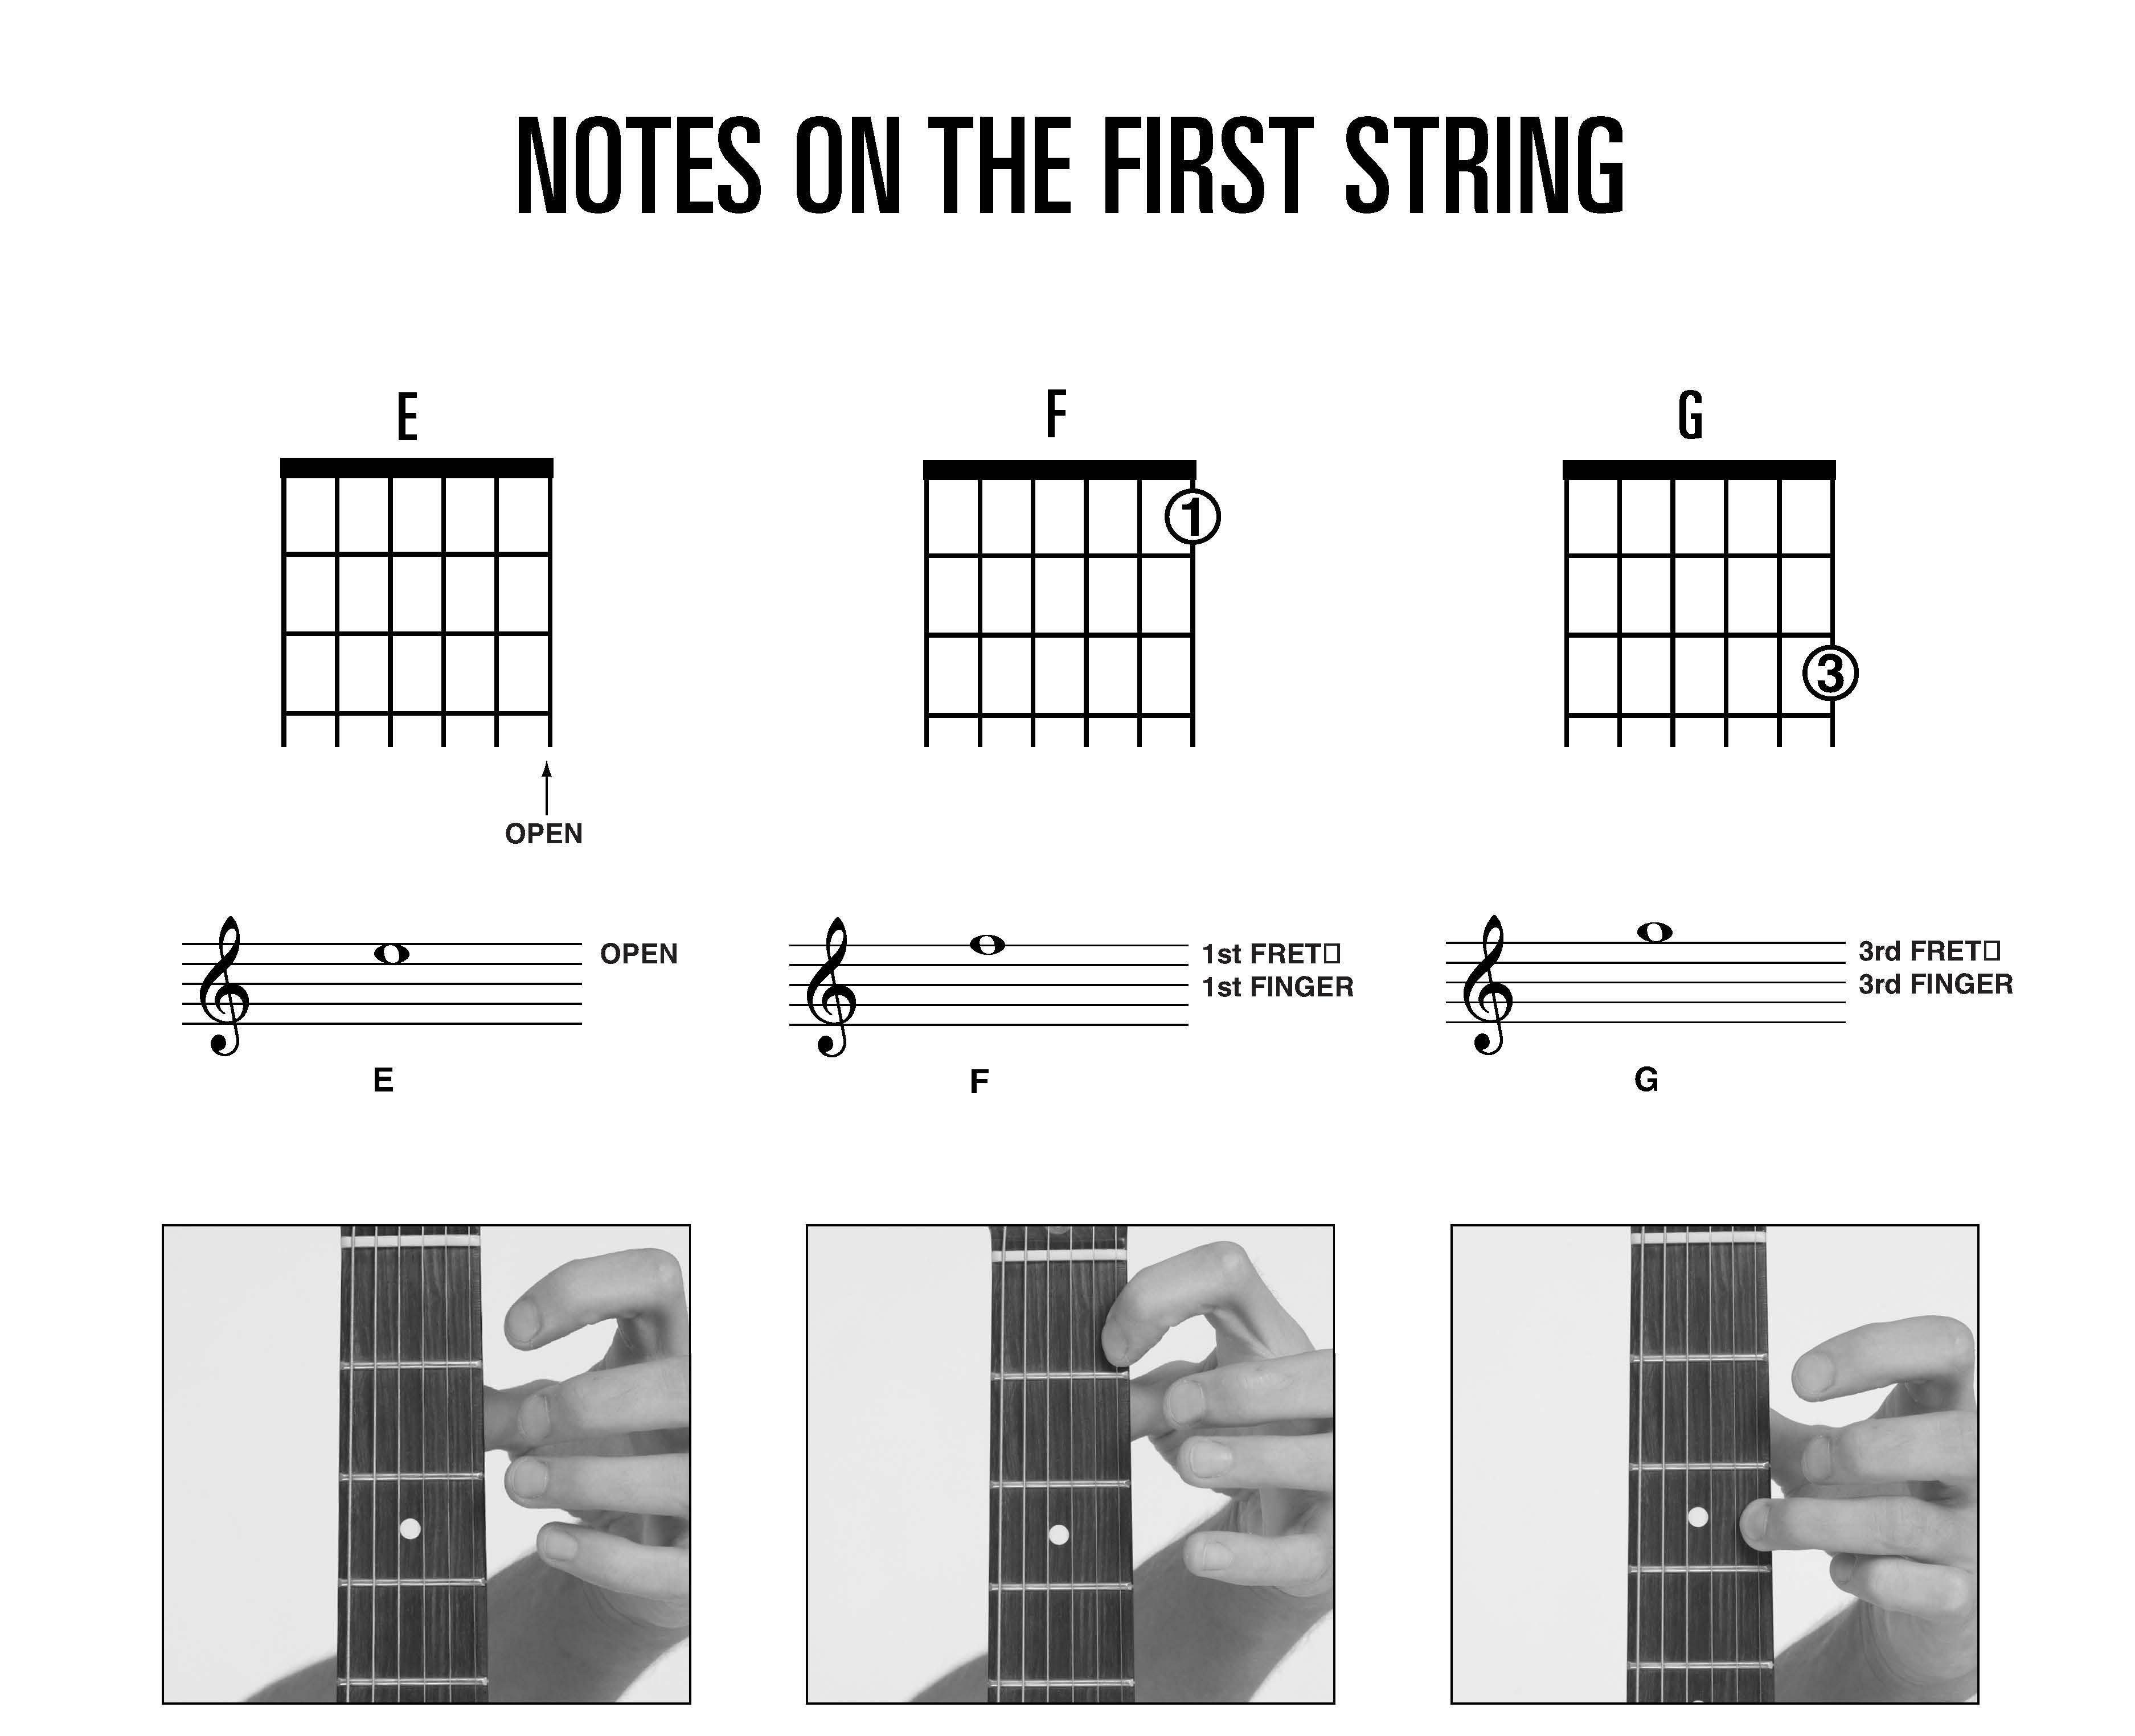 hal leonard guitar method book 2 pdf